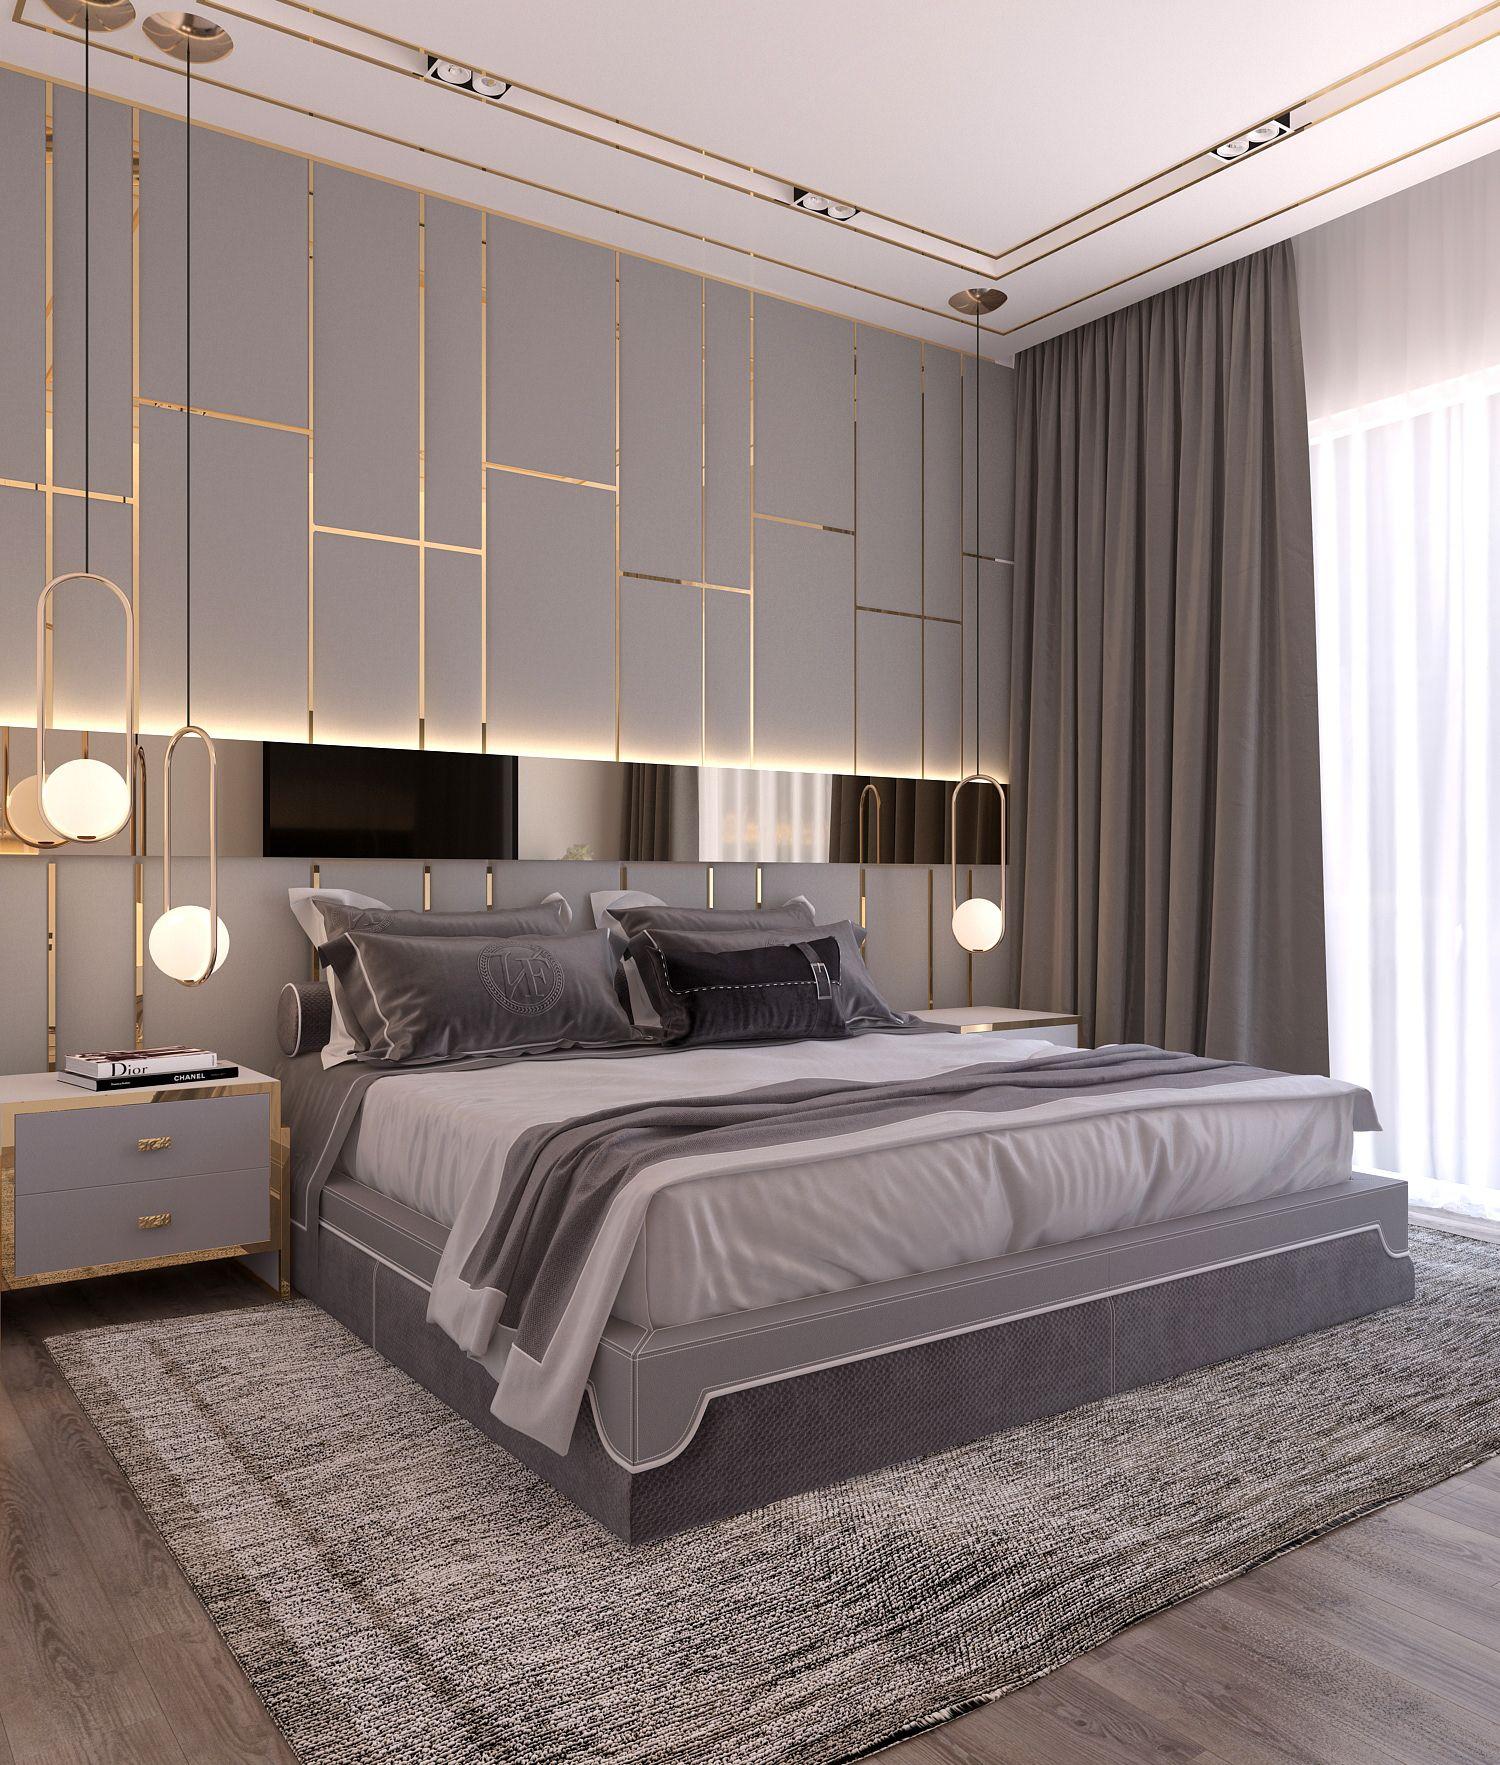 Modern Style Bedroom Dubai Project On Behance